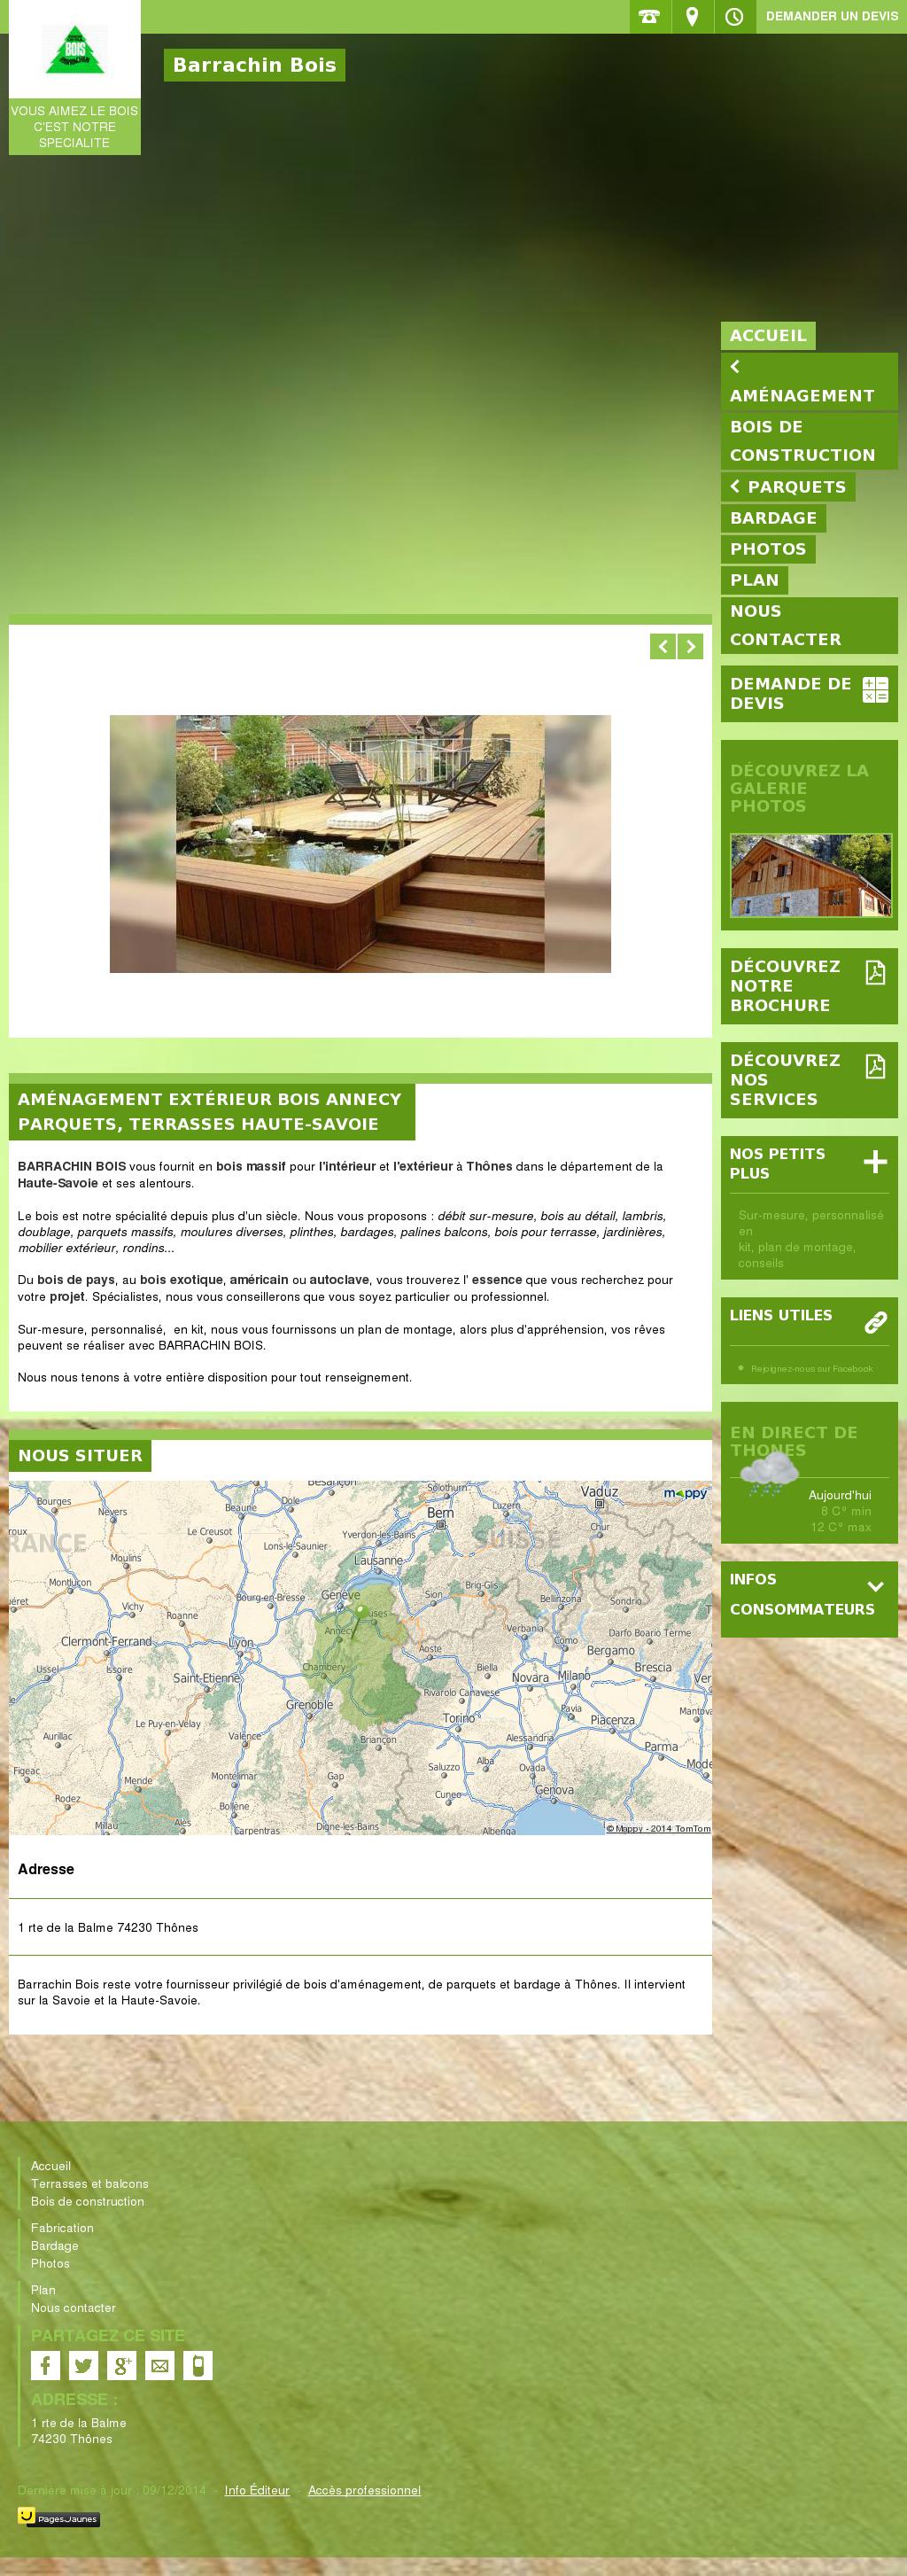 Construction Pergola Bois Plan barrachin bois competitors, revenue and employees - owler